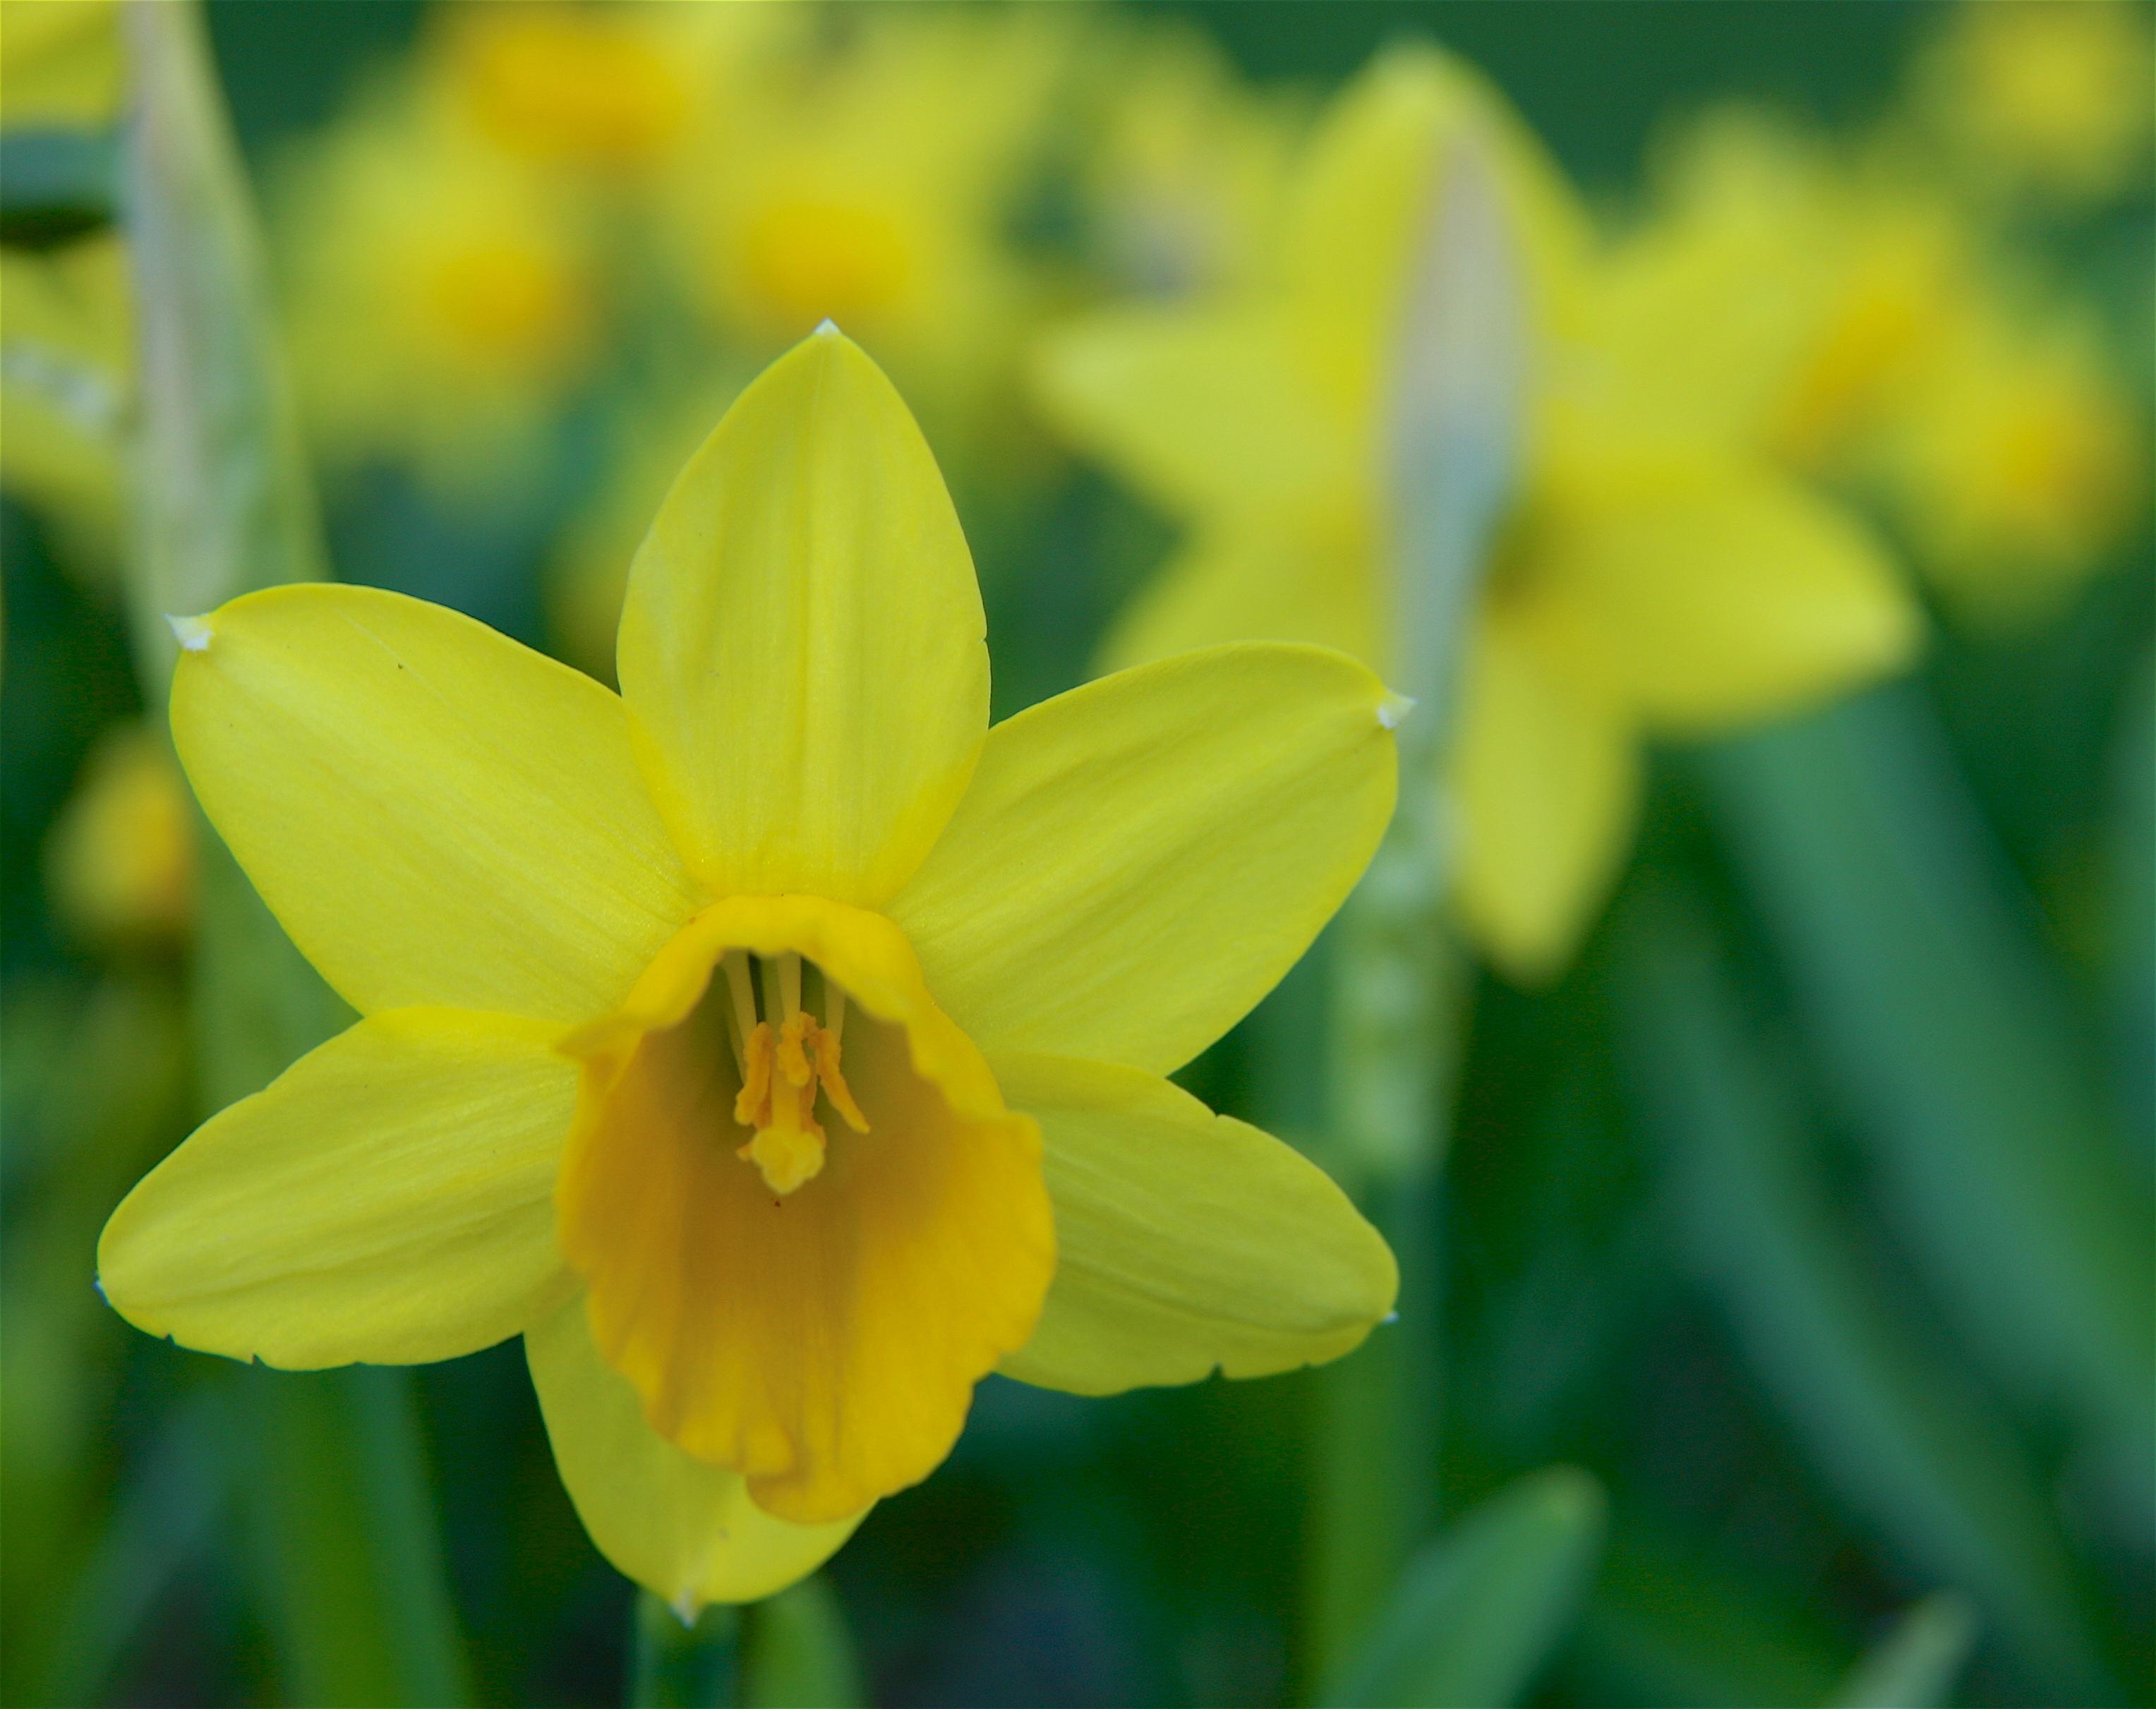 daffodil - photo #29